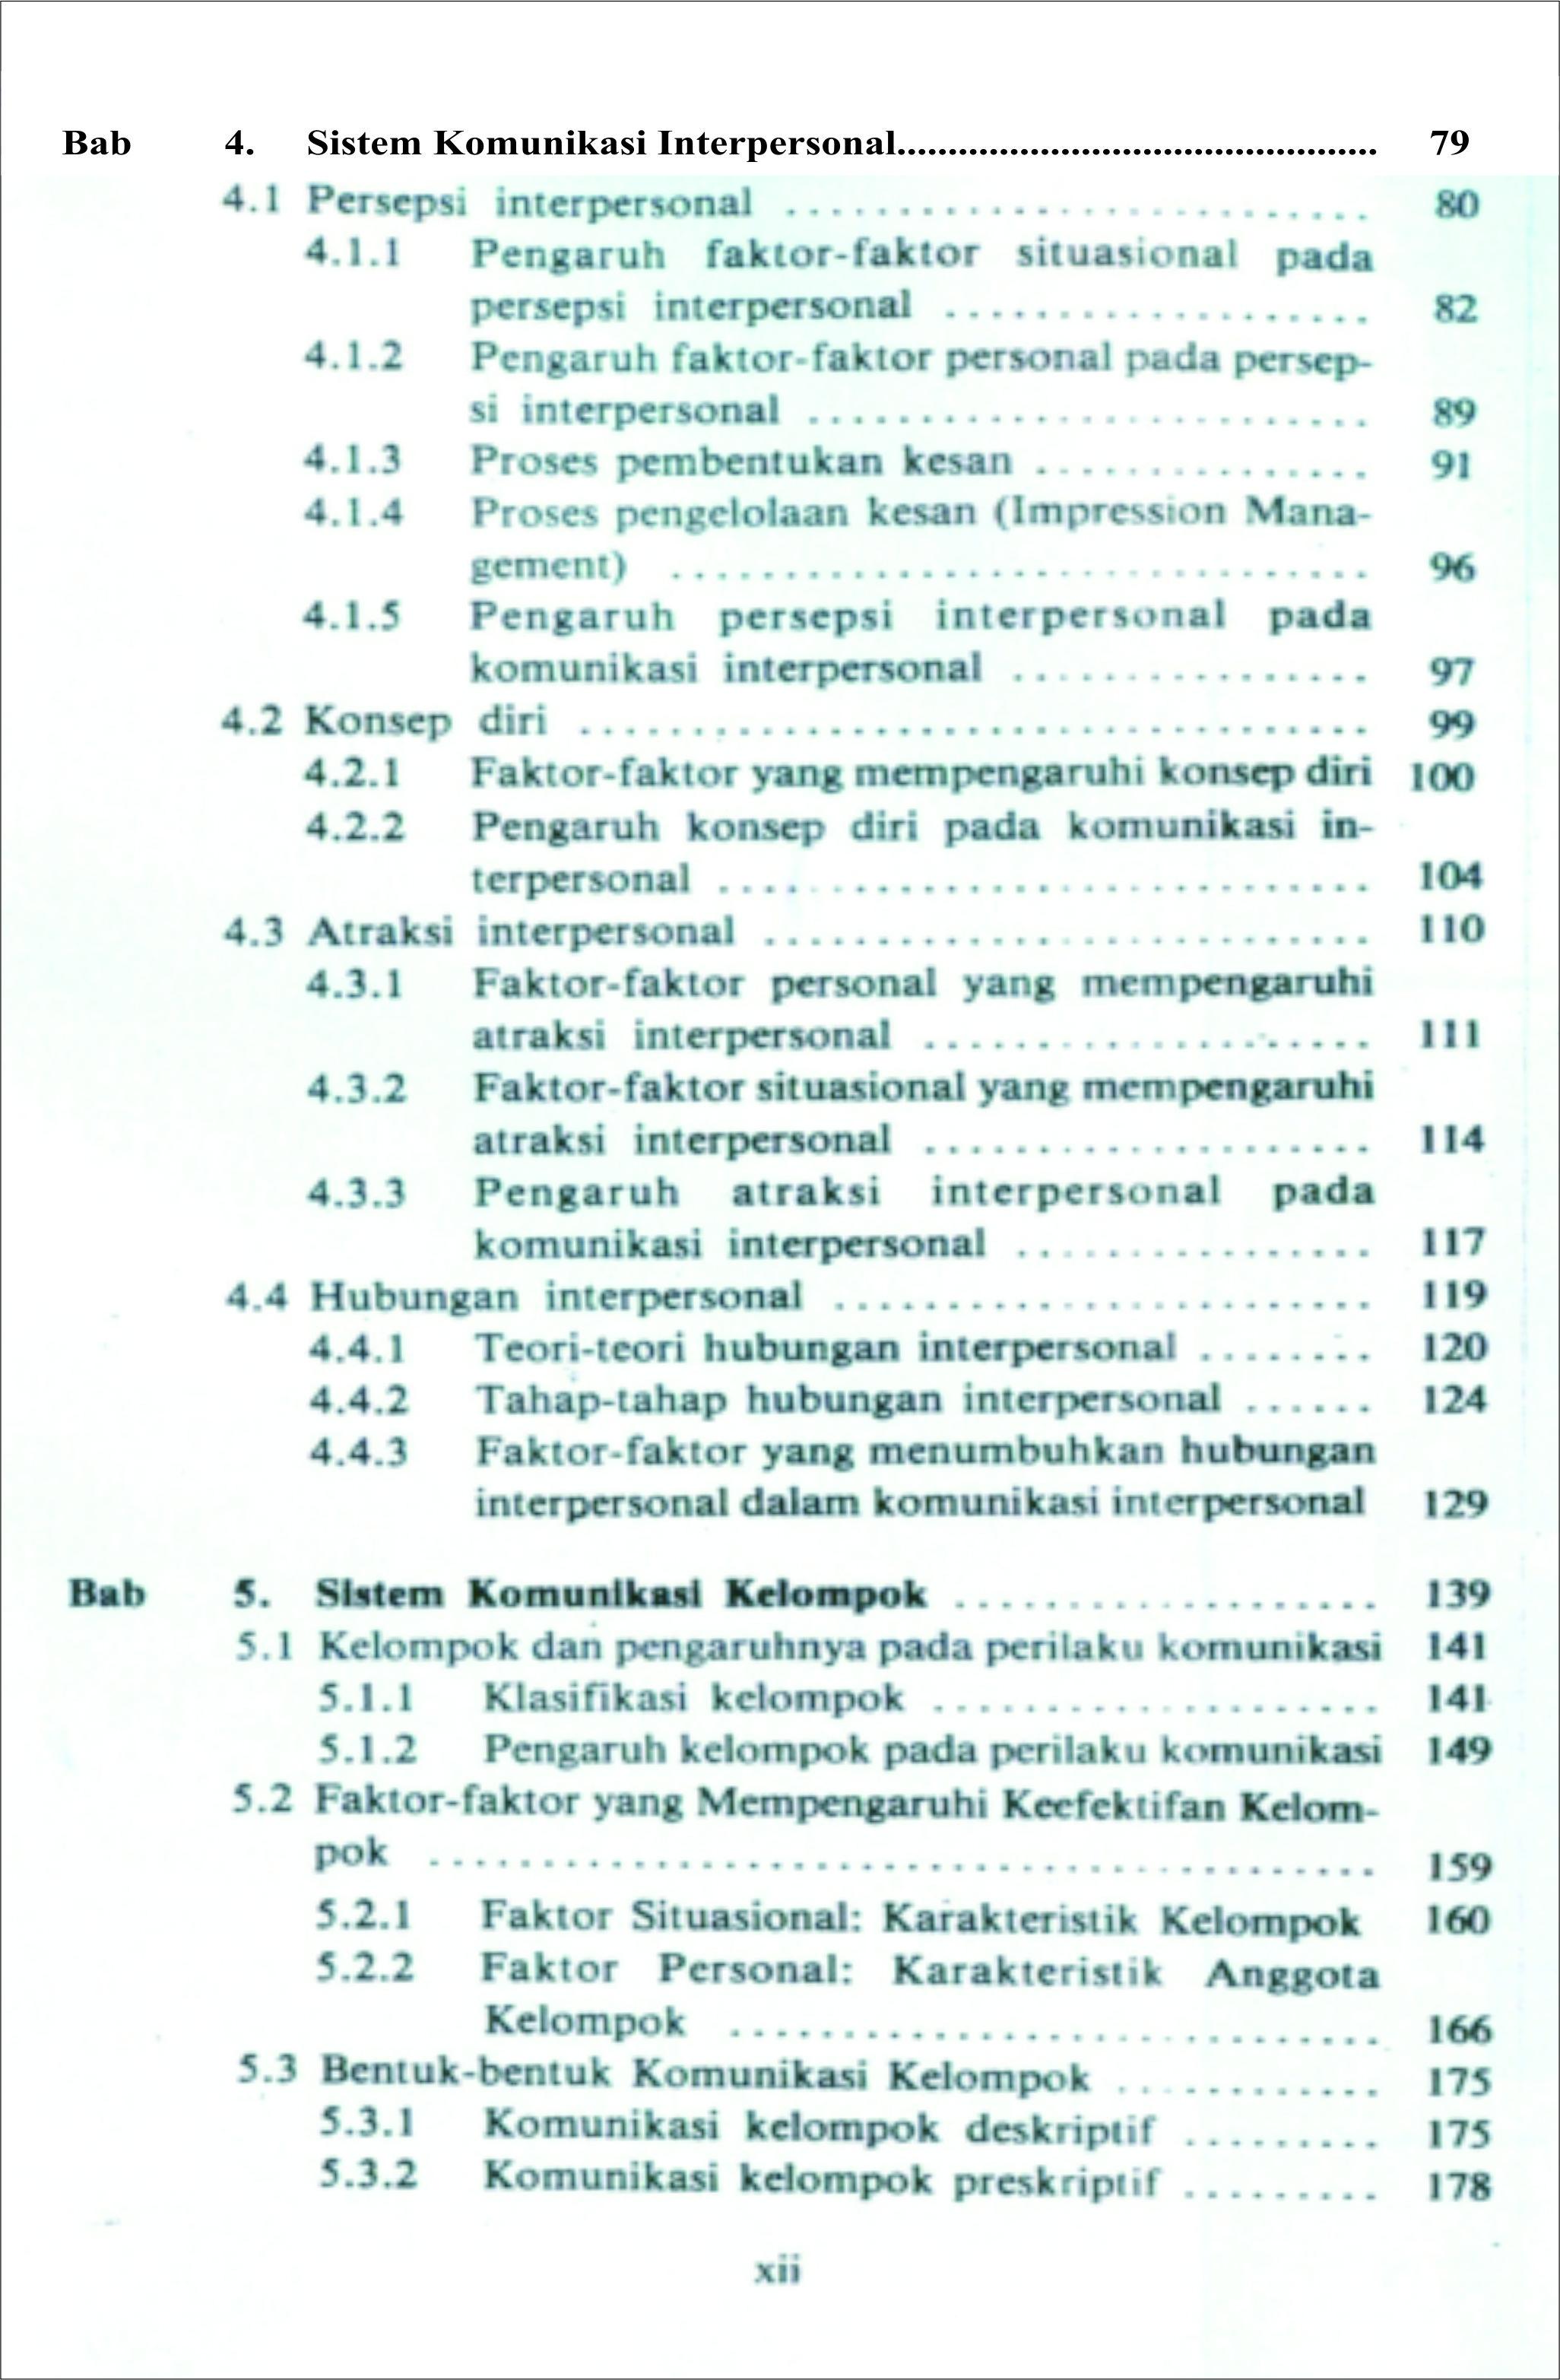 Ebook Rekayasa Sosial Jalaluddin Rakhmat